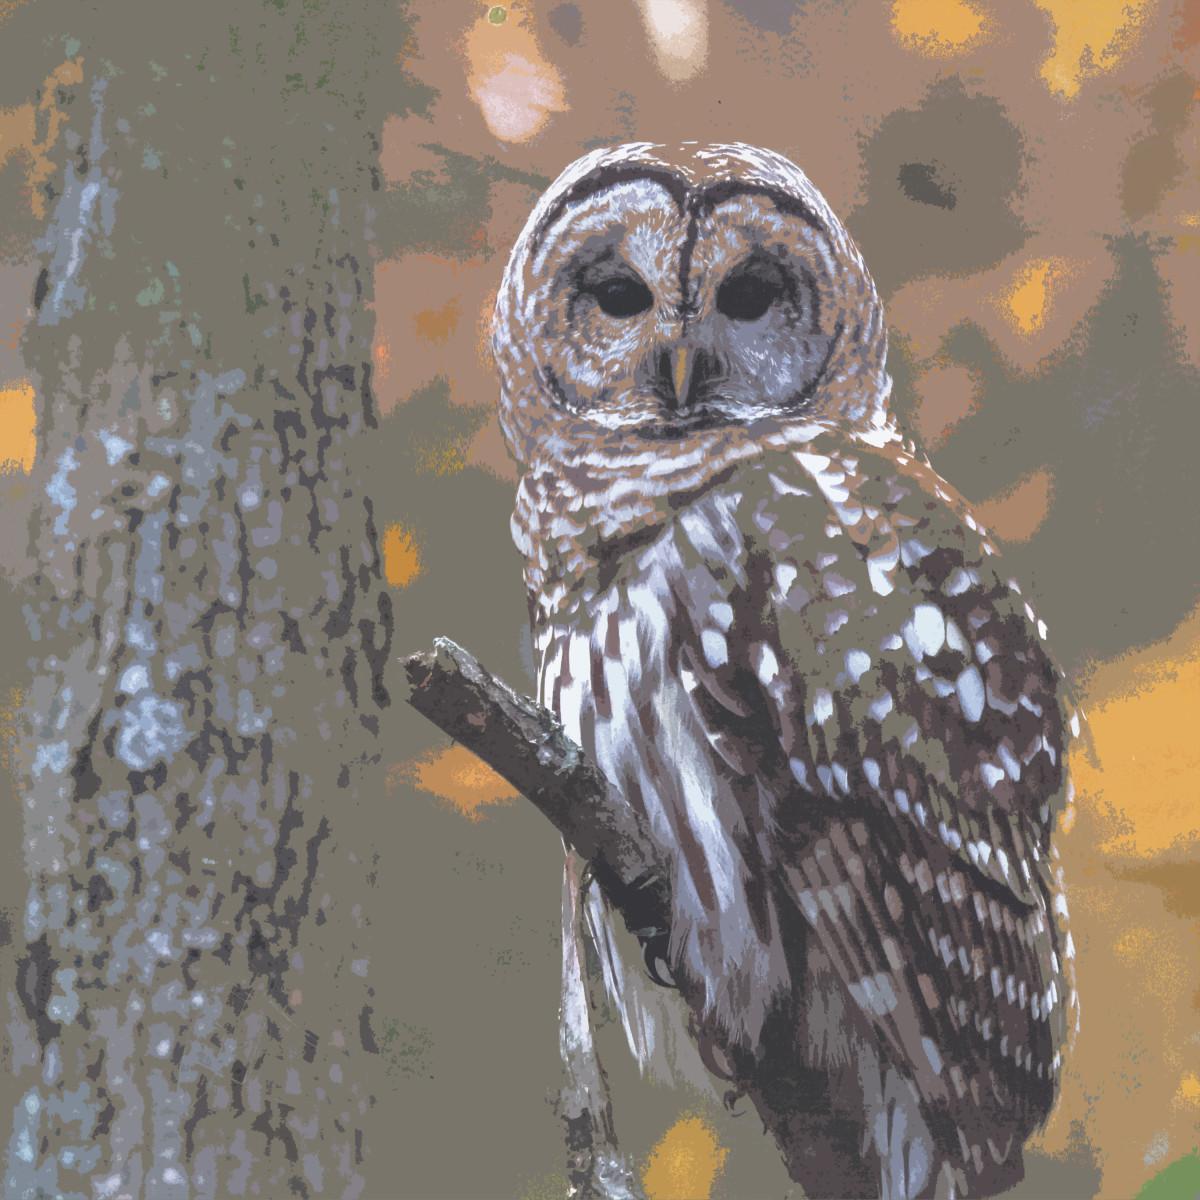 Barred Owl by Gina Godfrey